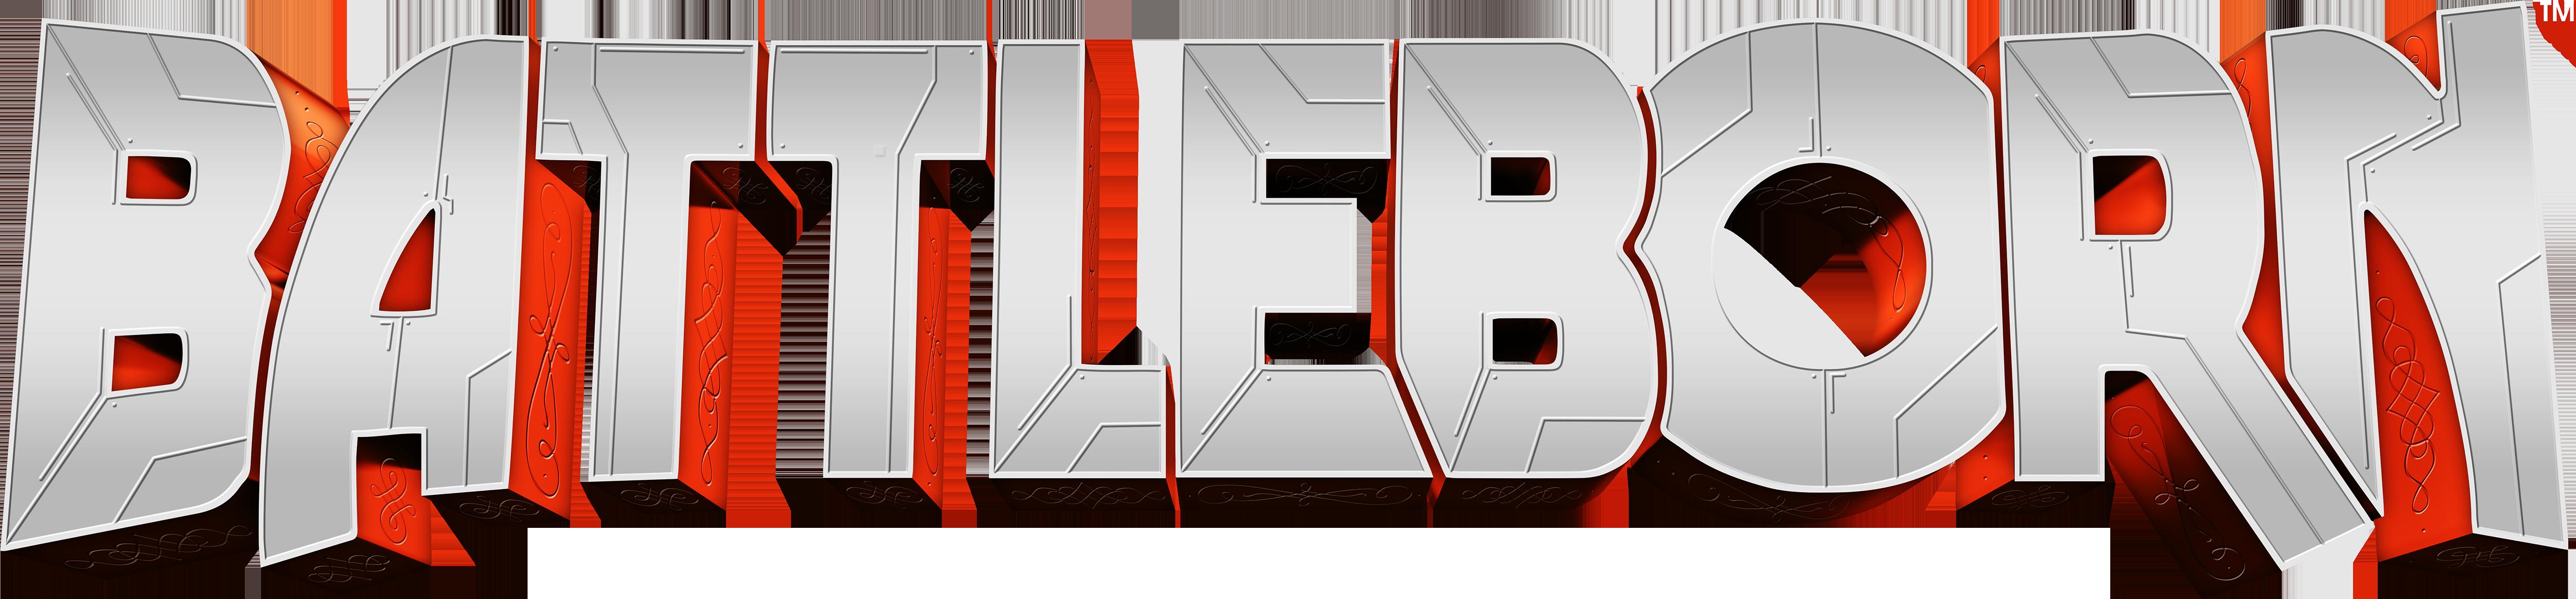 Battleborn Logo Png